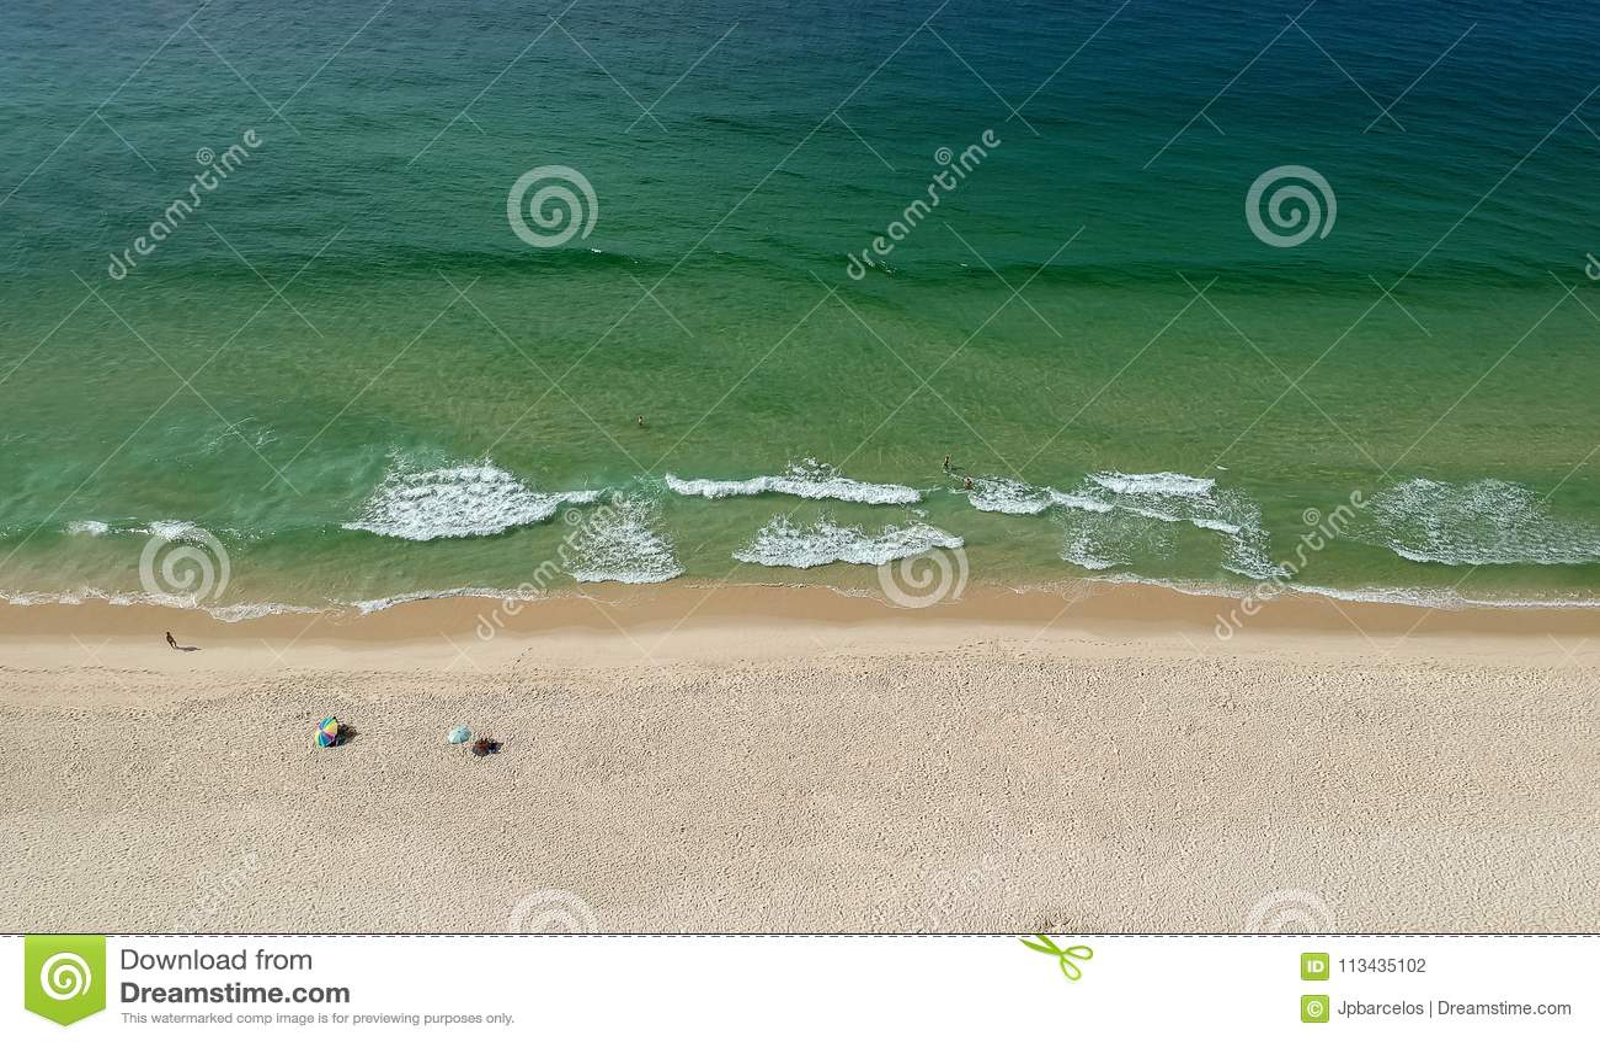 Drone panorama of Barra da Tijuca beach, Rio de Janeiro, Brazil.